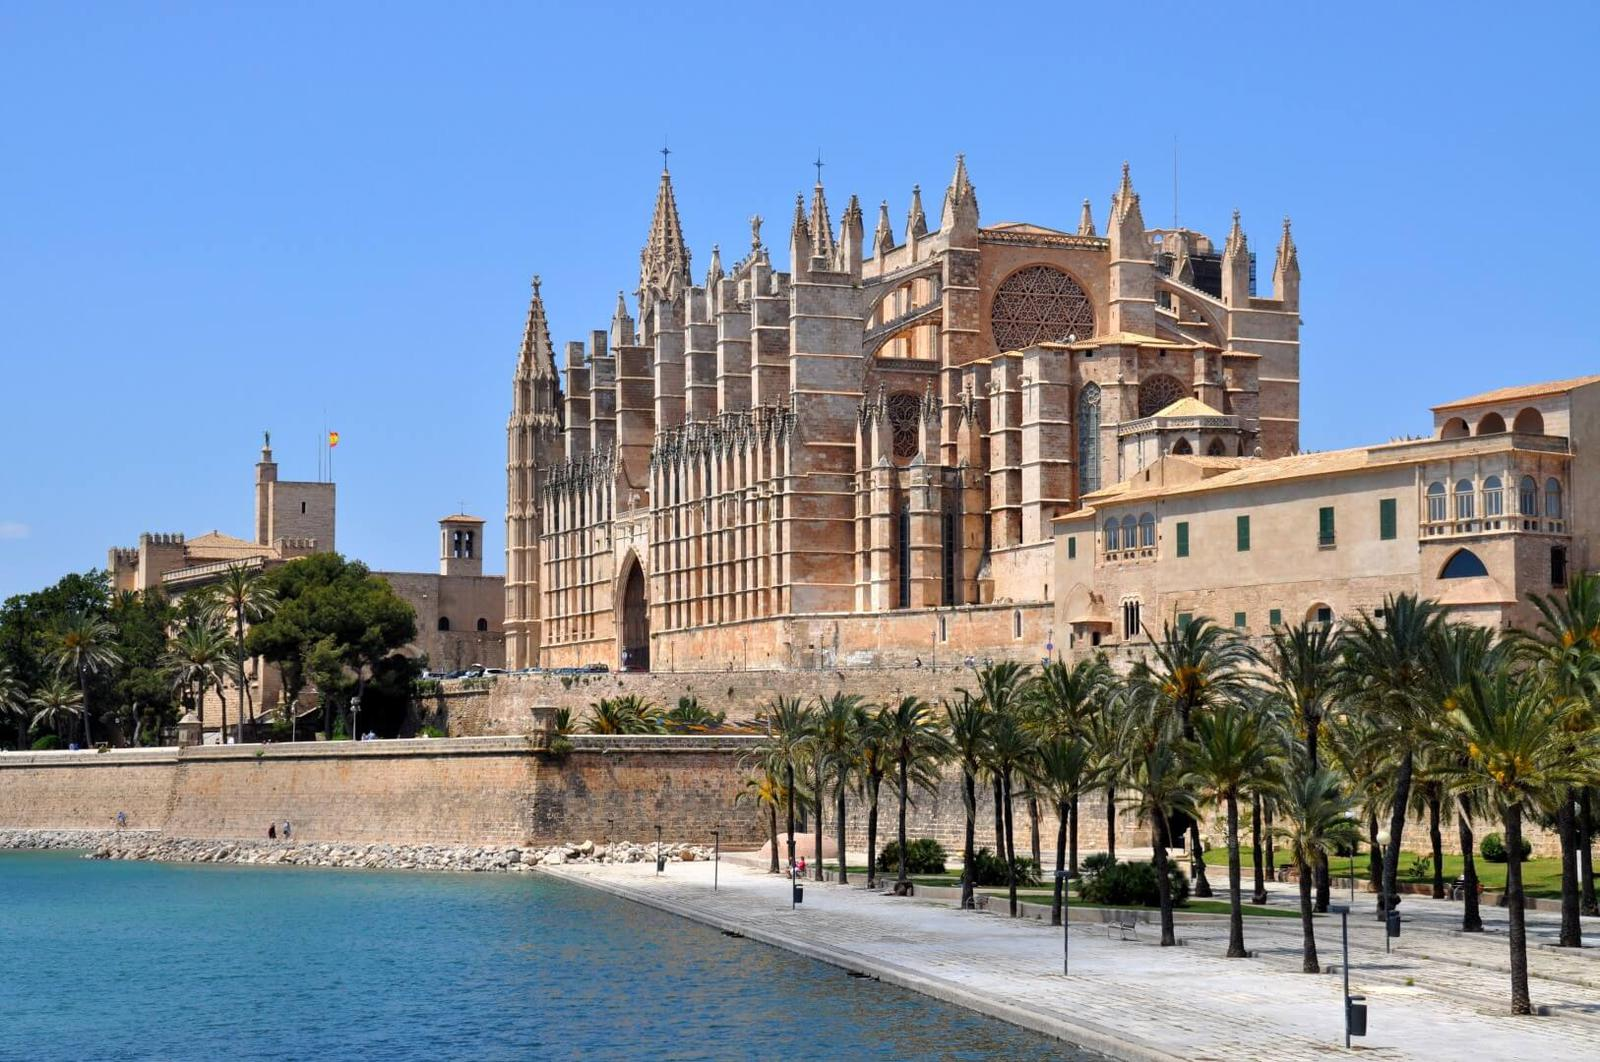 Spain_Balearic Islands_Palma de Mallorca_Cathedral of Palma and Parc de la Mar_Fotolia (1)